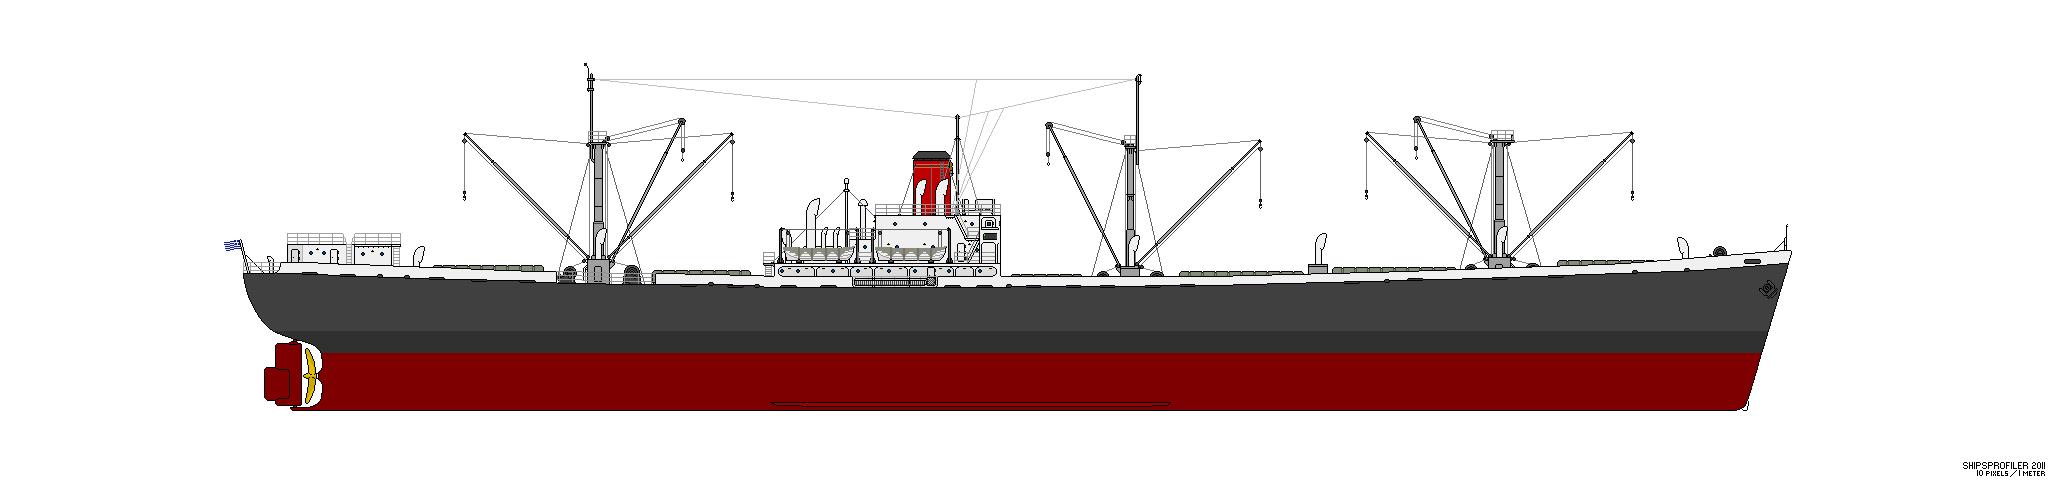 Liberty Ship (les années de guerre) Libert13